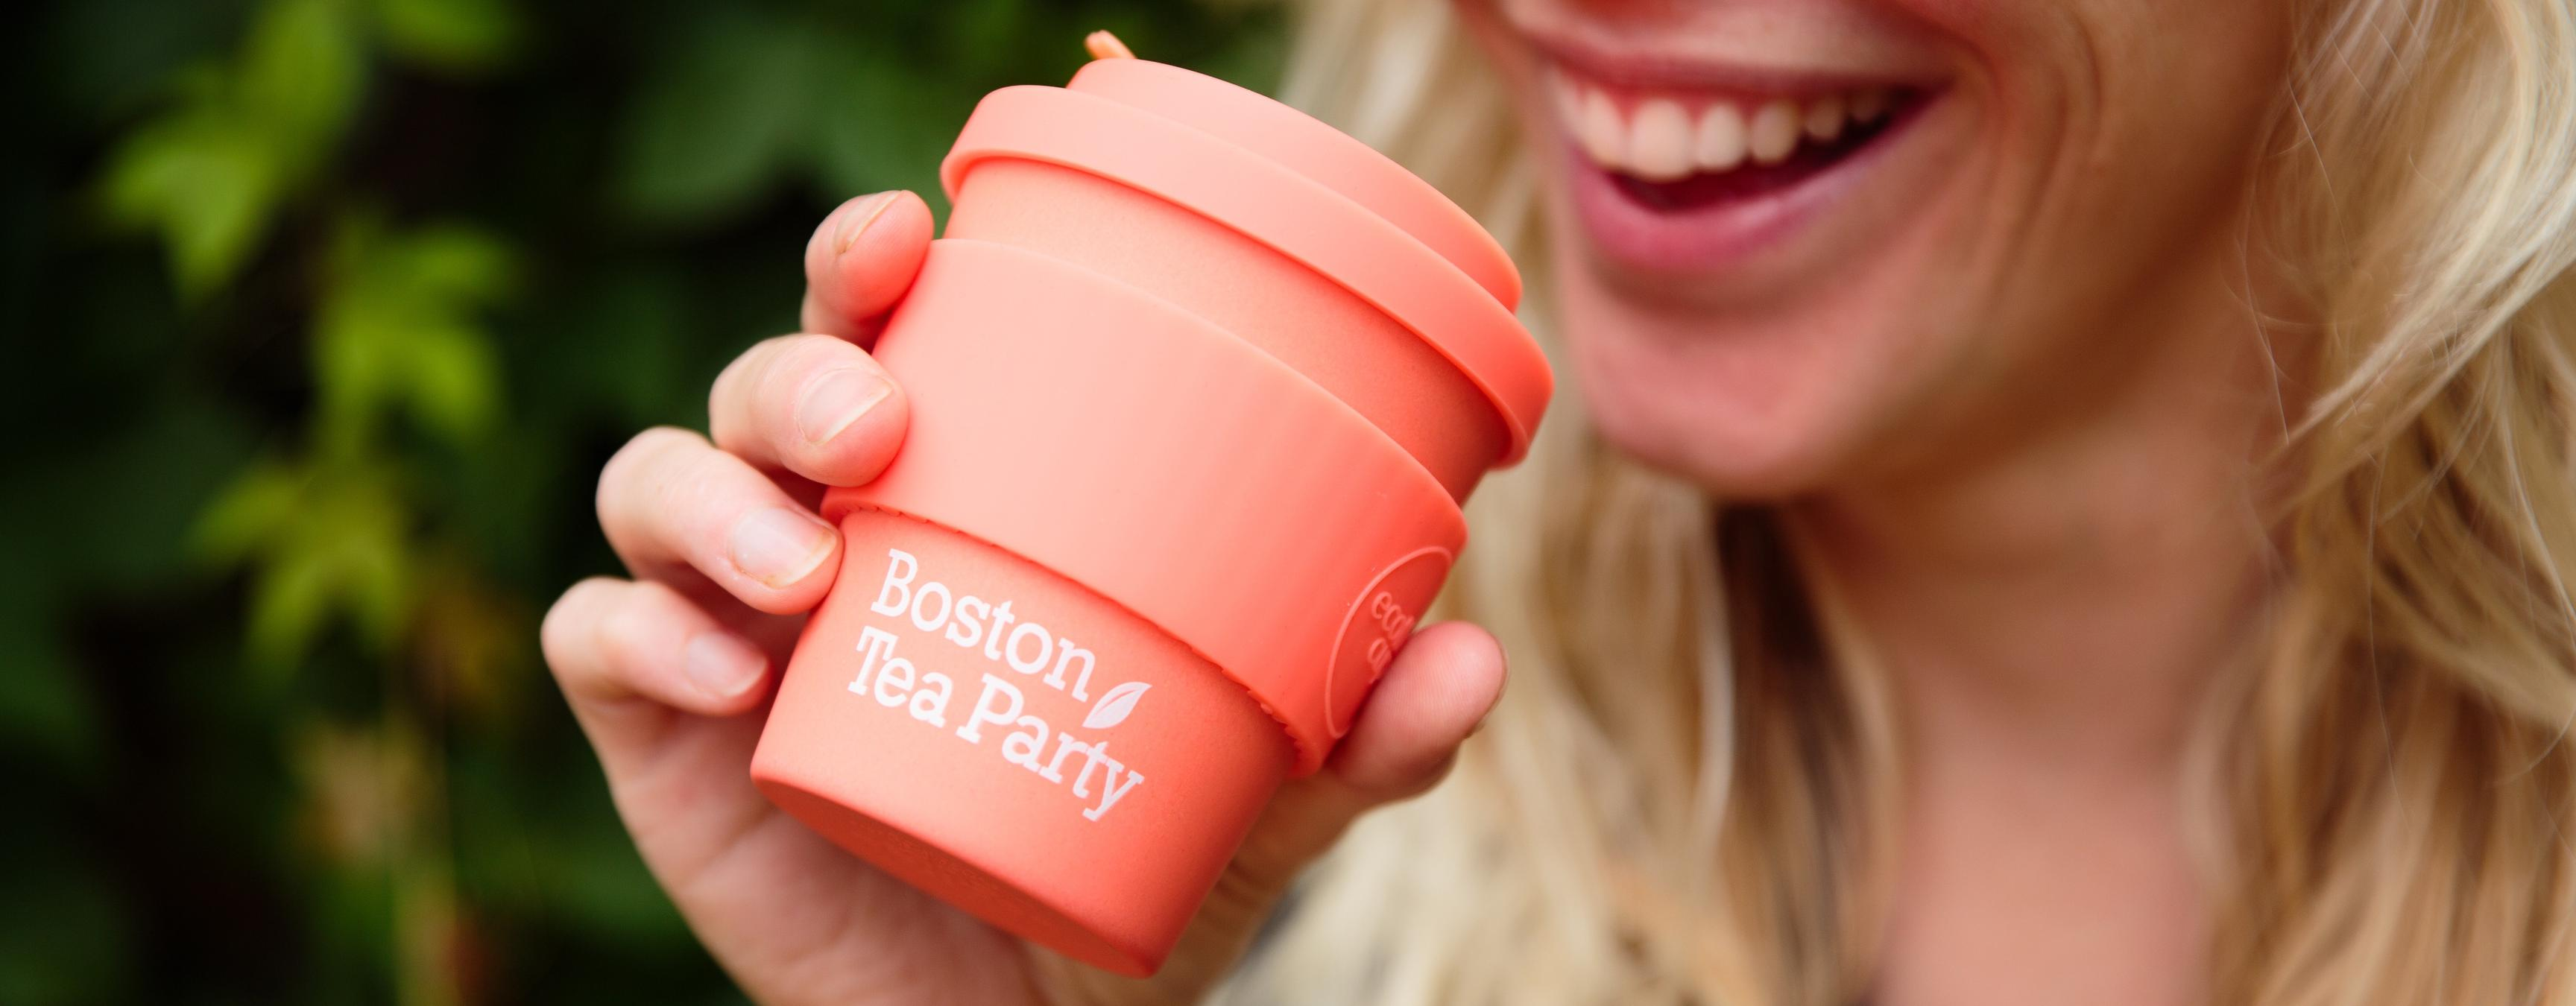 Boston Tea Party - Head Office Brand Cover